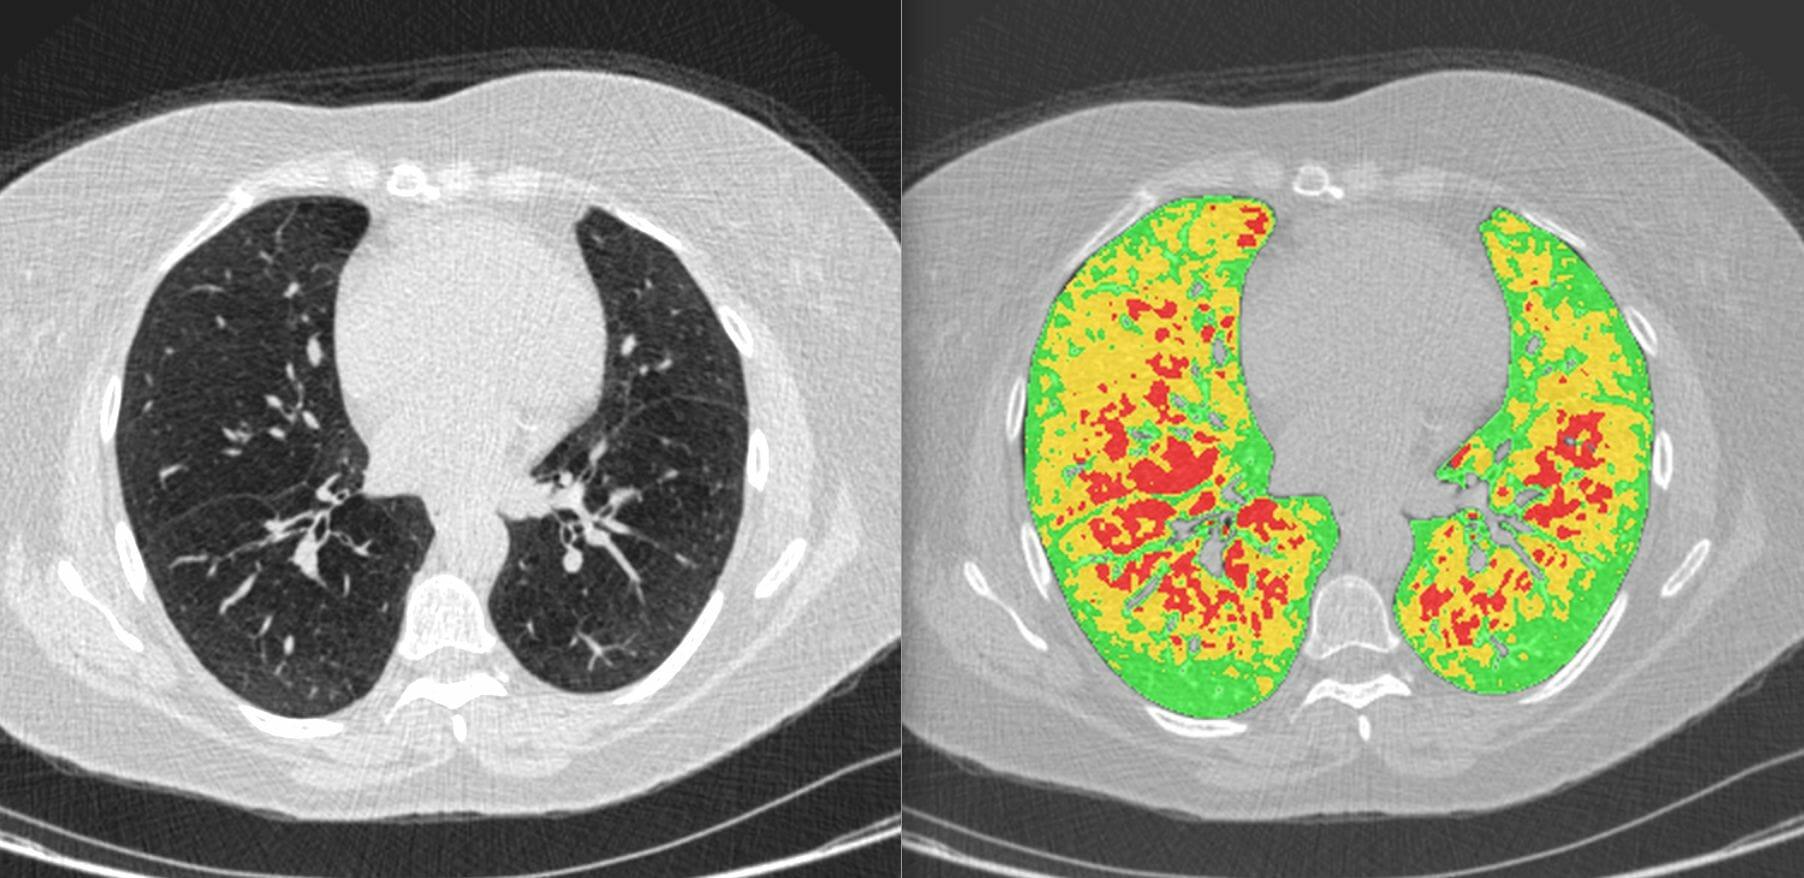 LDA Functional_Osirix screenshot (COPD subject)